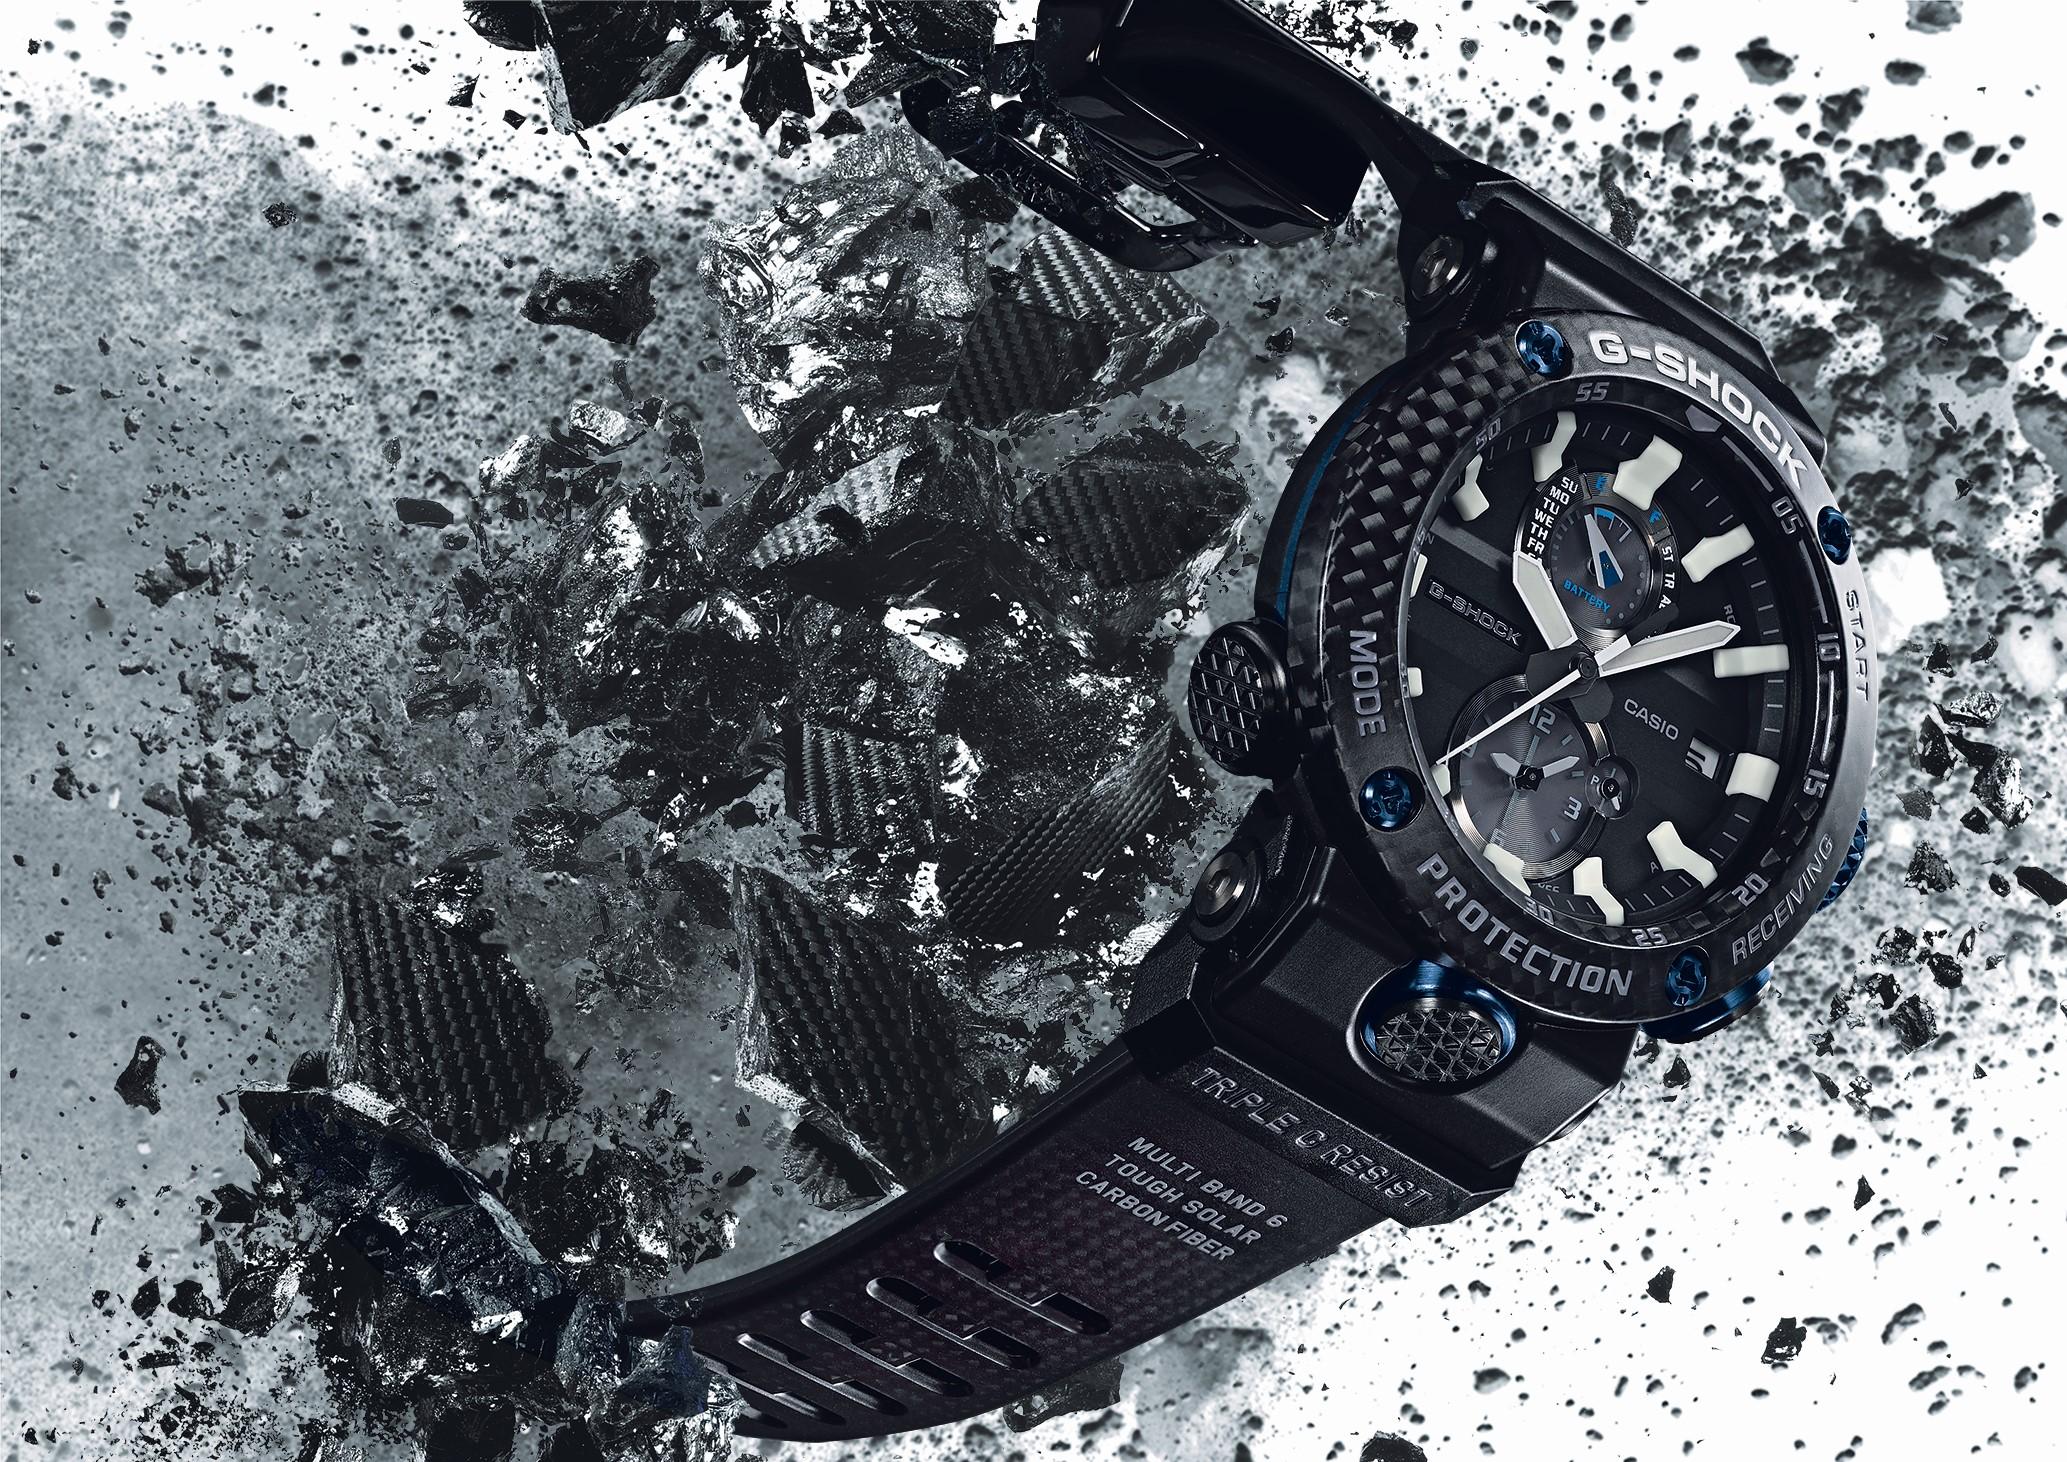 casio g shock gravitymaster gwr b1000 fulfils your daily carbon fibre intake